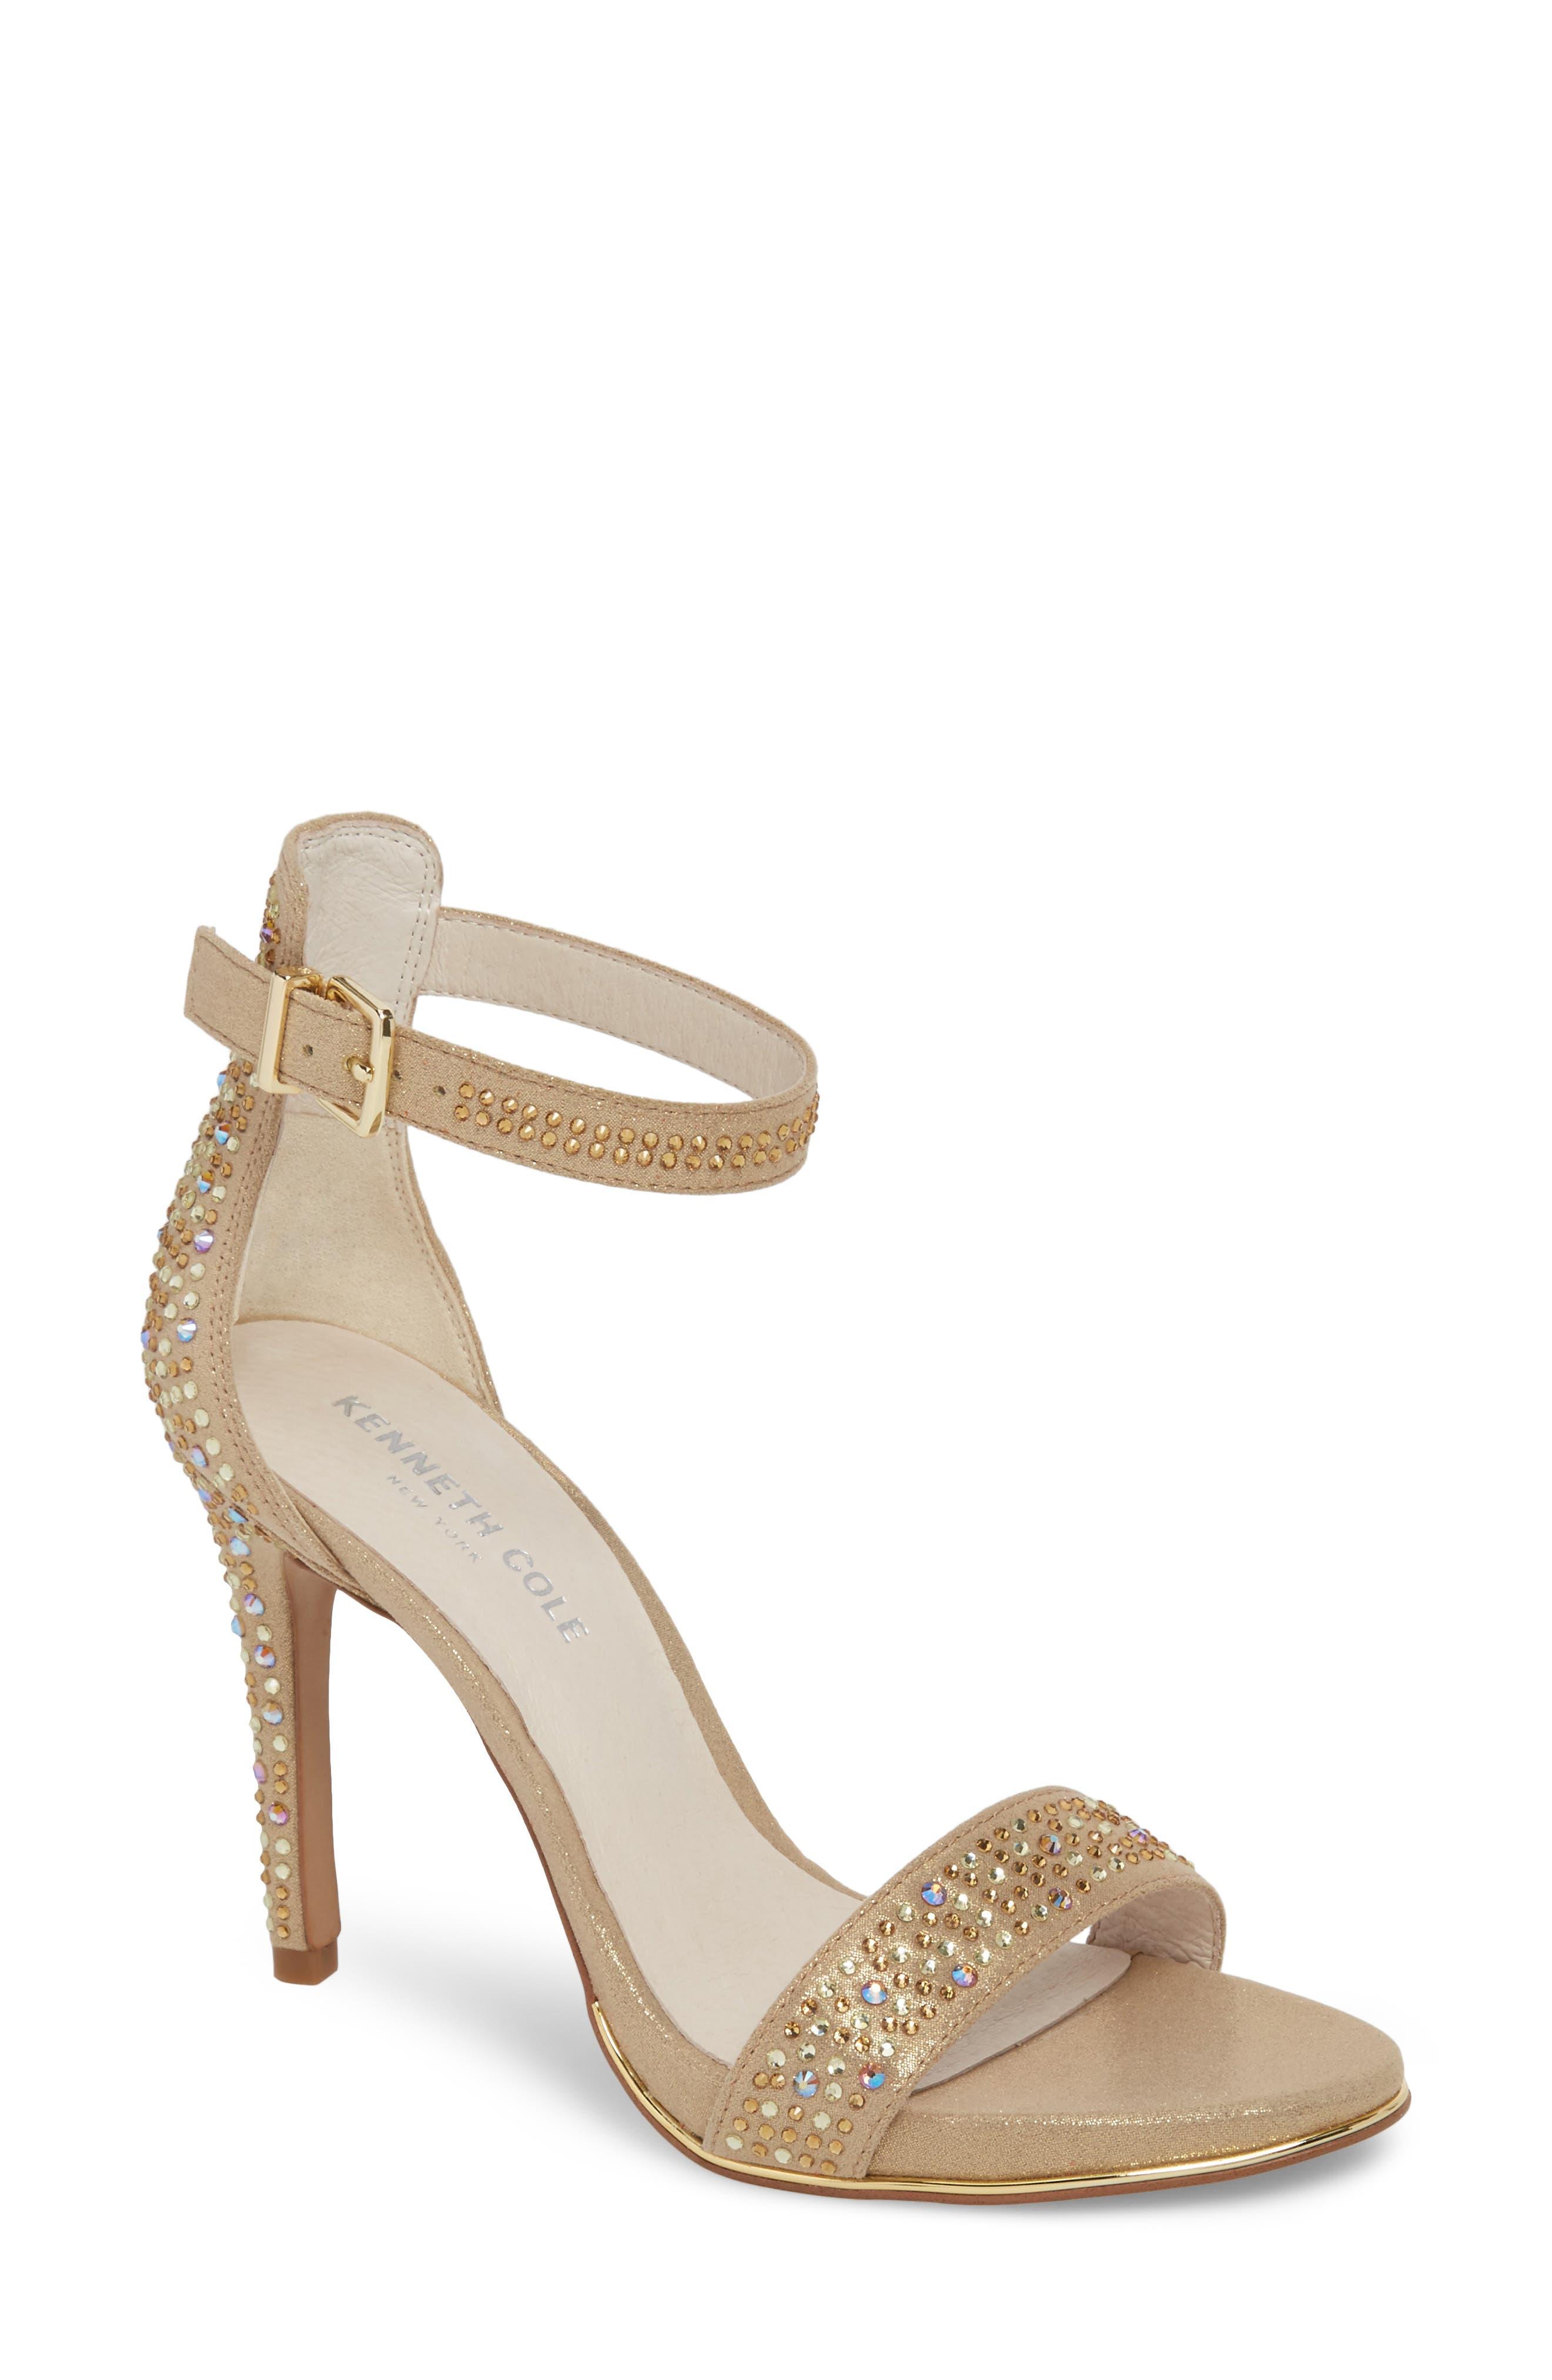 Kenneth Cole New York 'Brooke' Ankle Strap Sandal (Women)